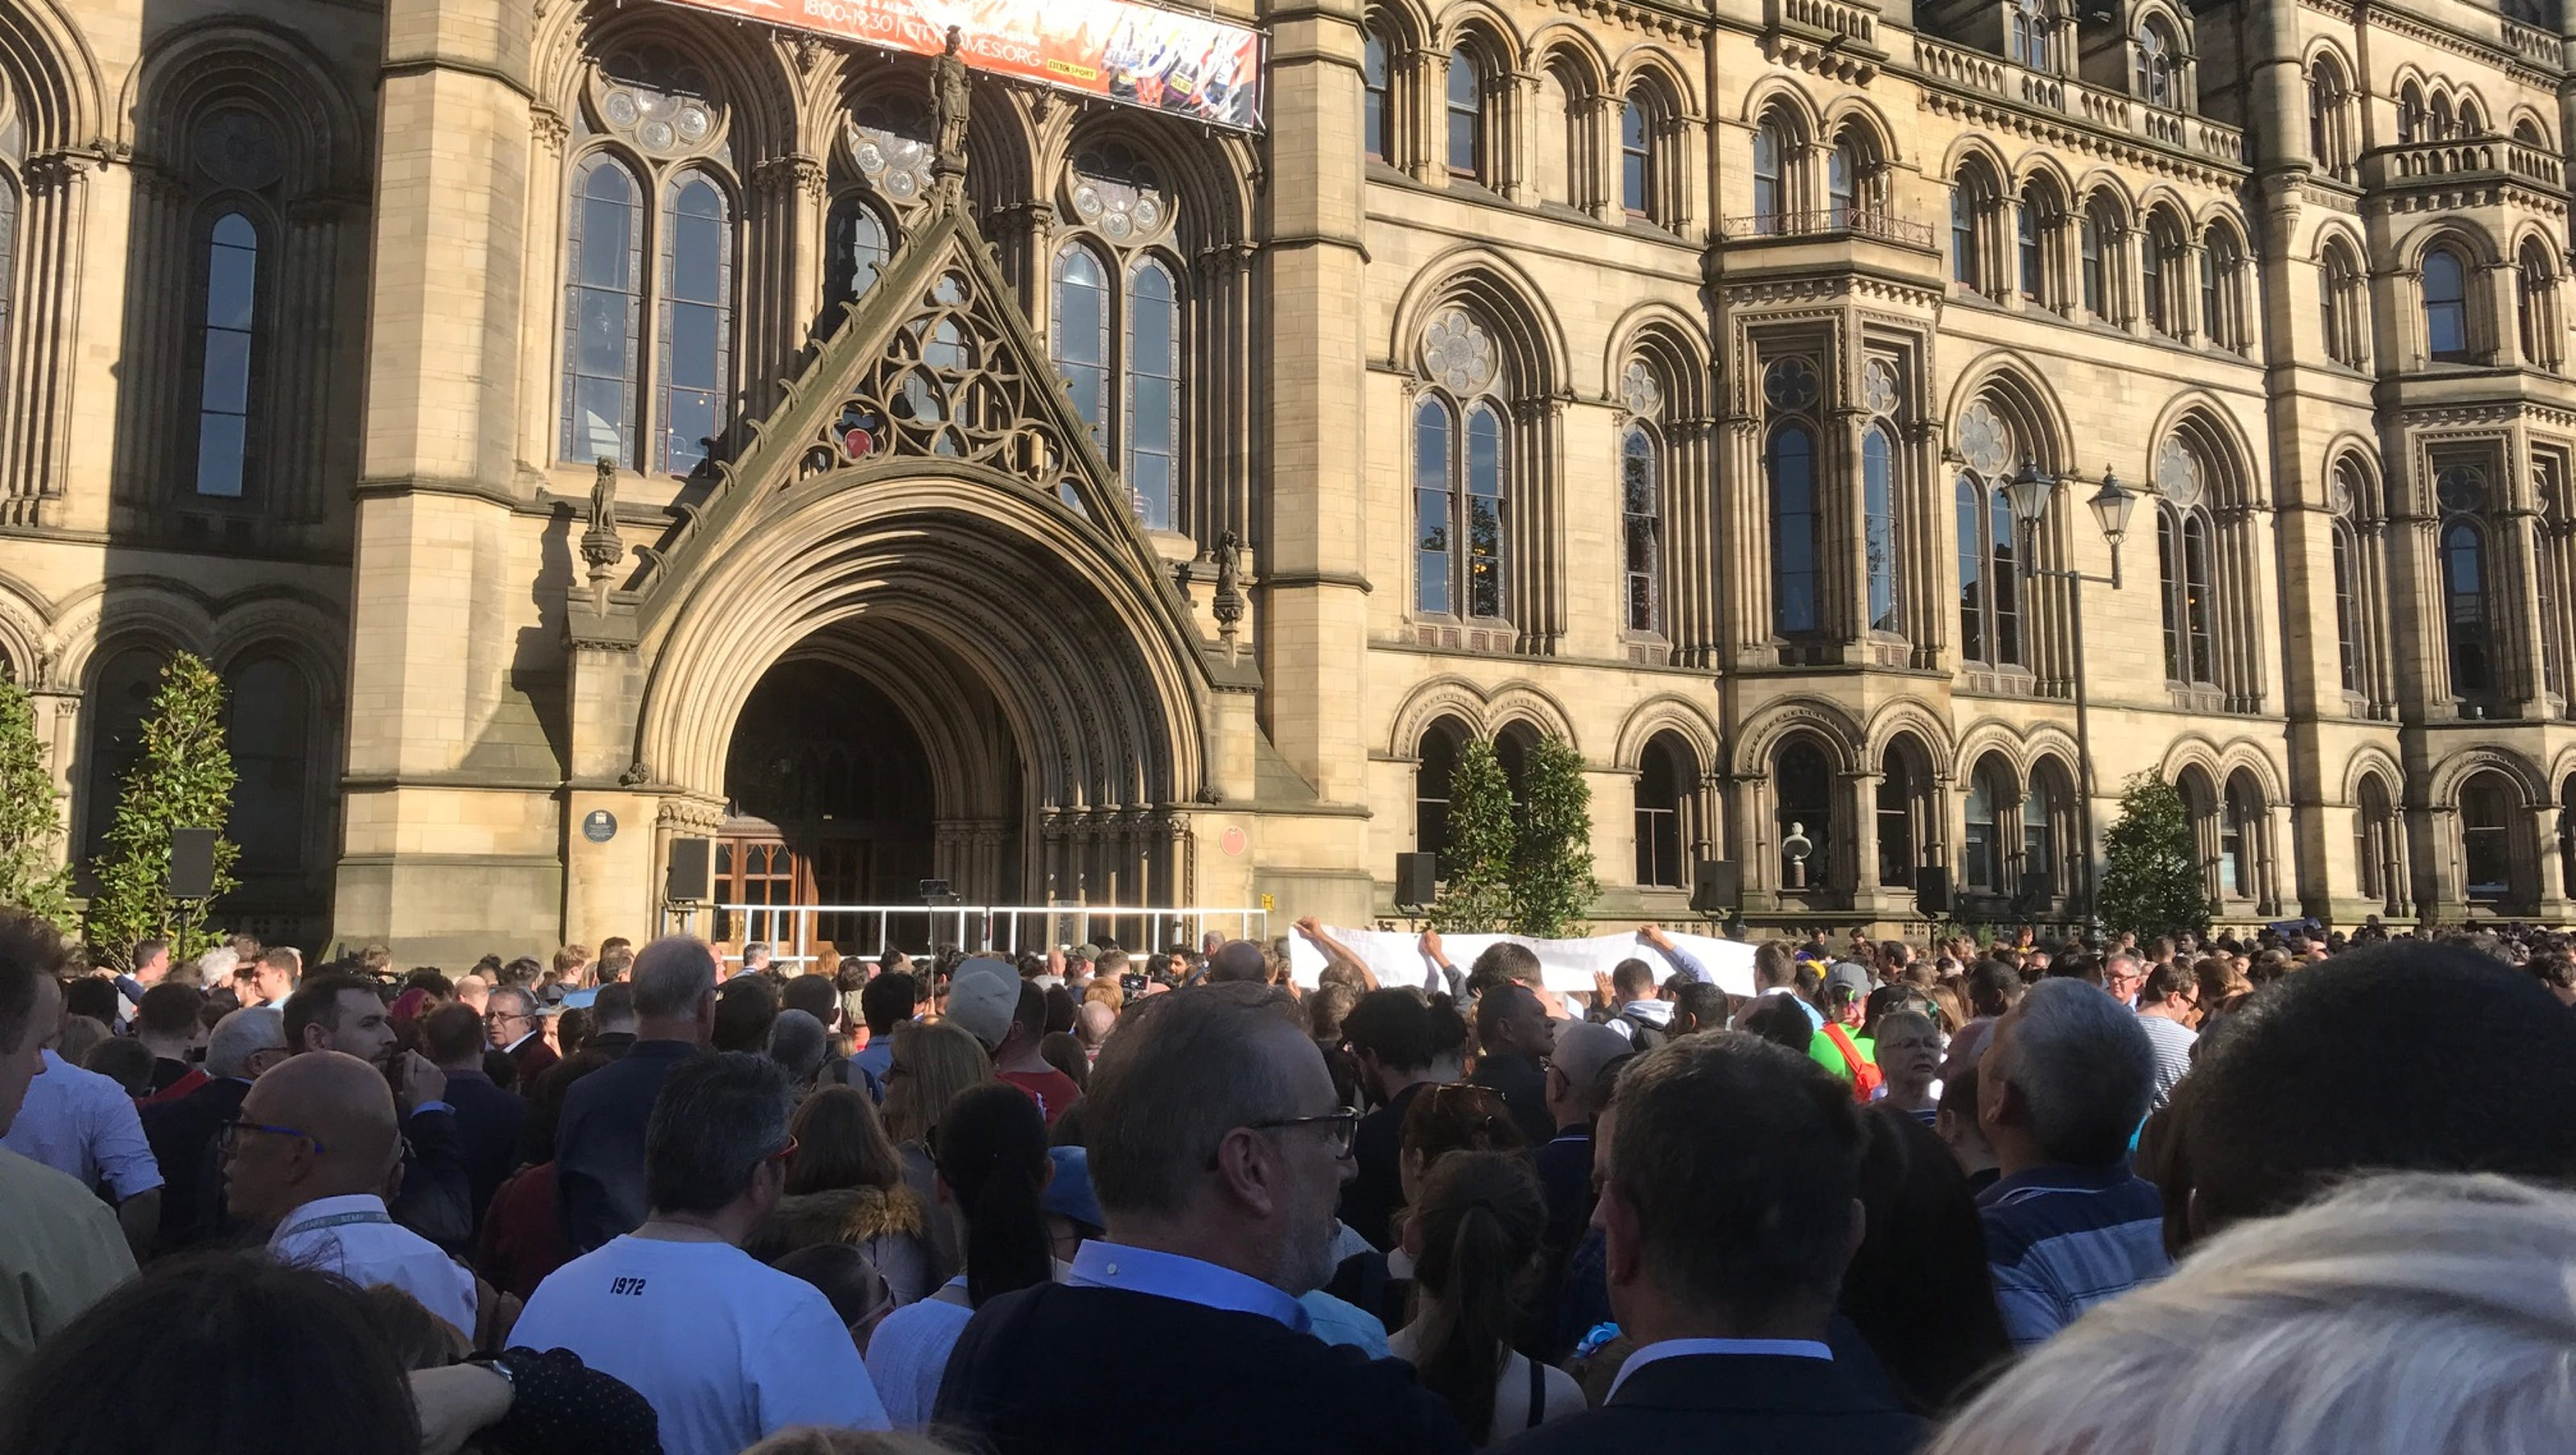 Manchester Over e but defiant at vigil